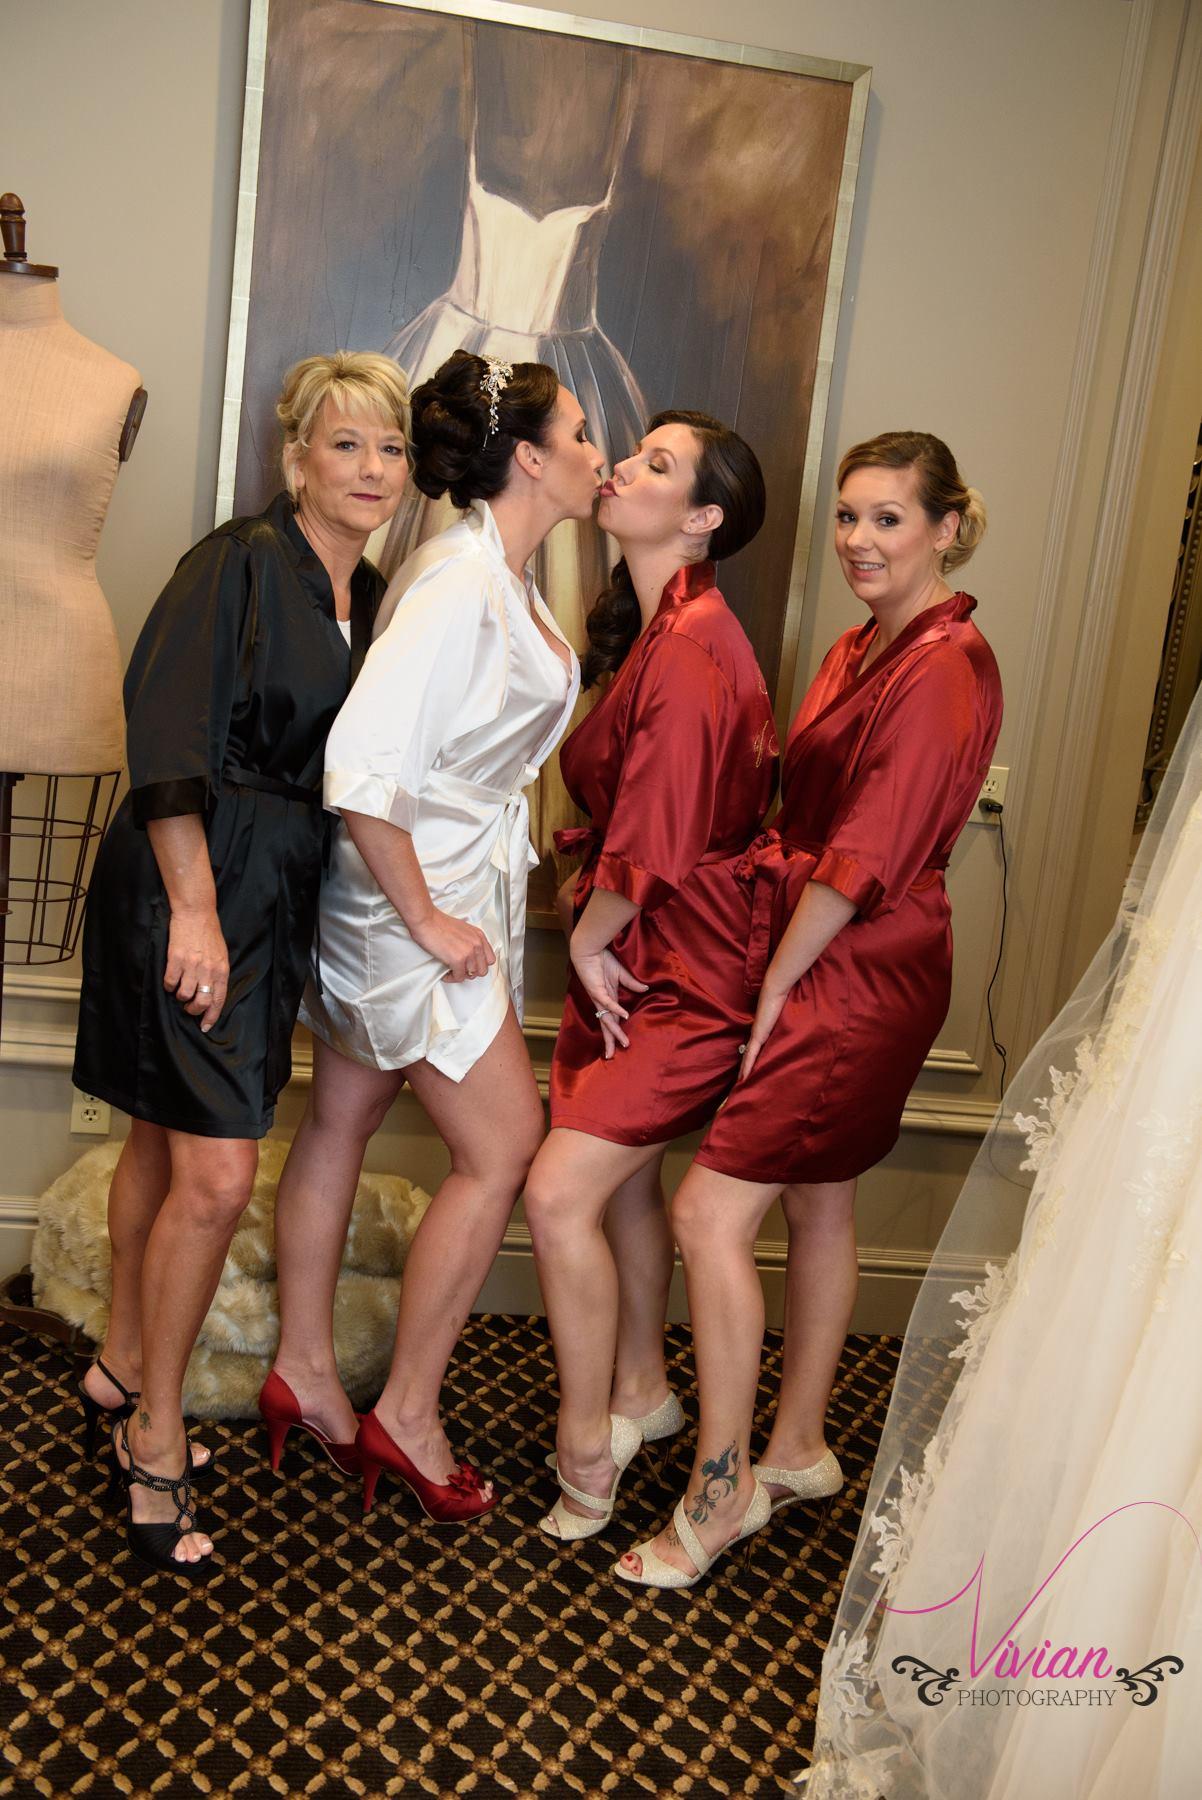 bride-bridesmaids-posing-for-camera-in-satin-robes.jpg